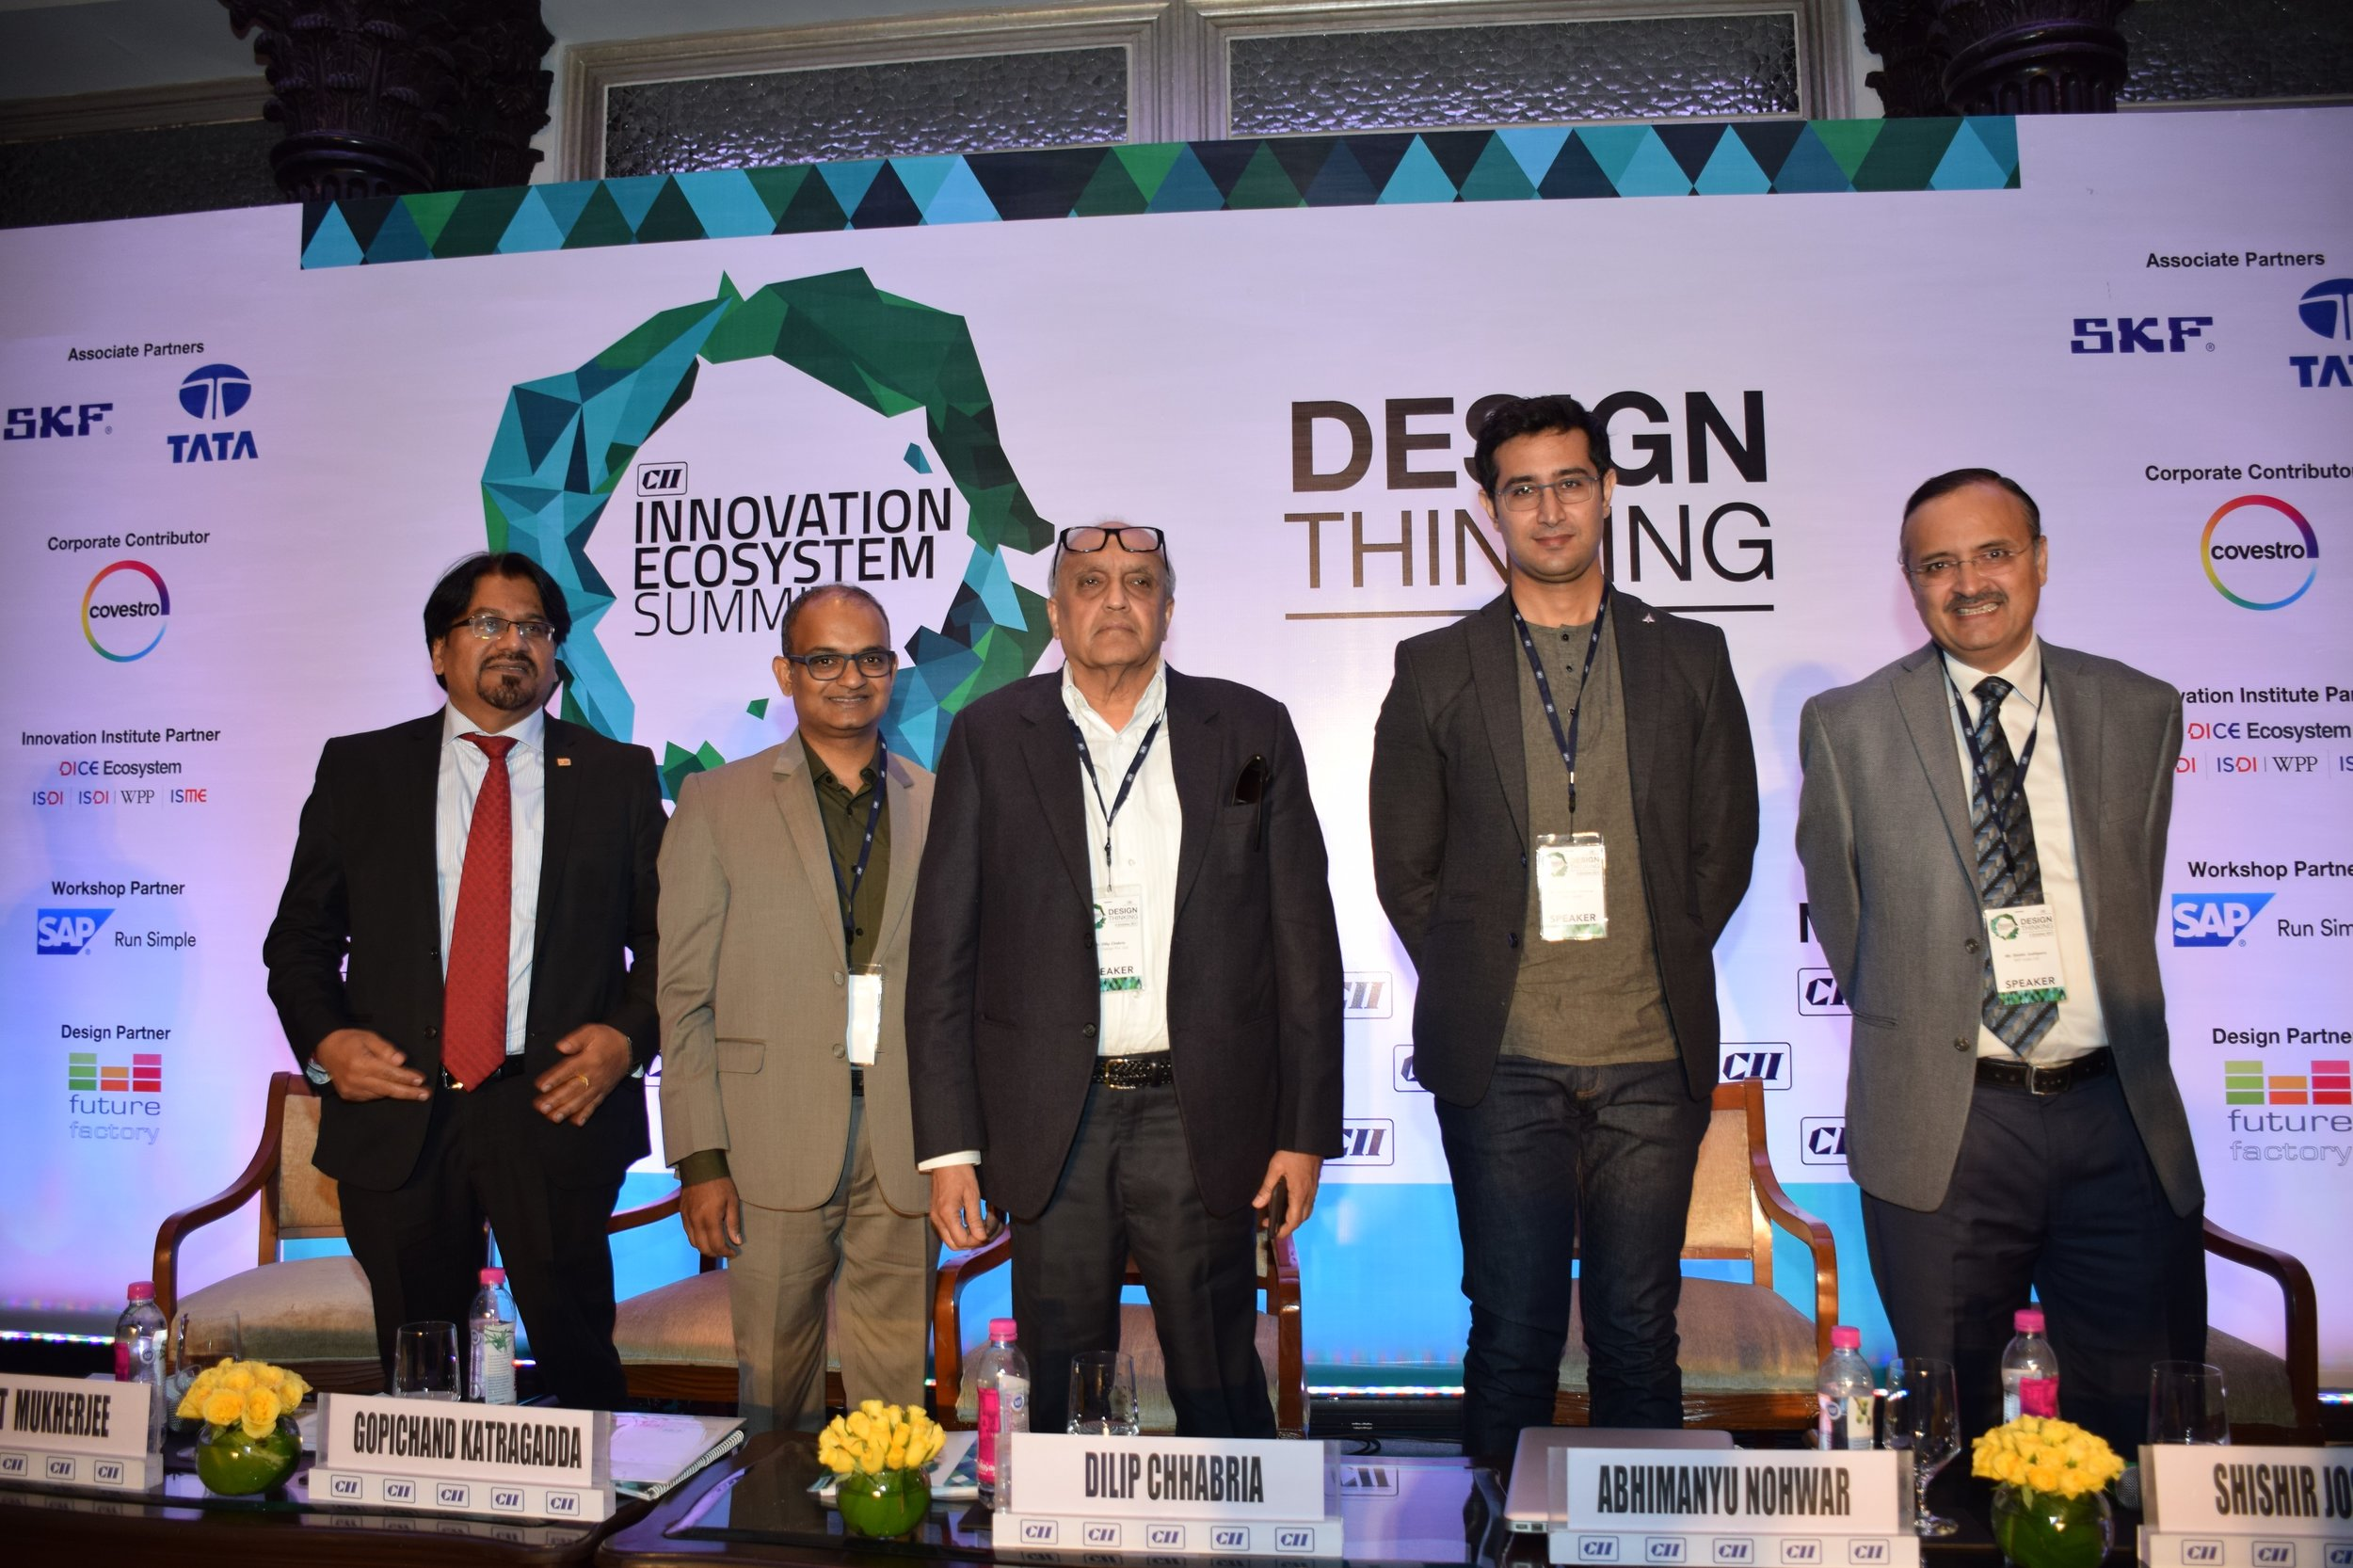 CII Innovation Ecosystem Summit 2017 speaker - Abhimanyu Nohwar - 1.jpg